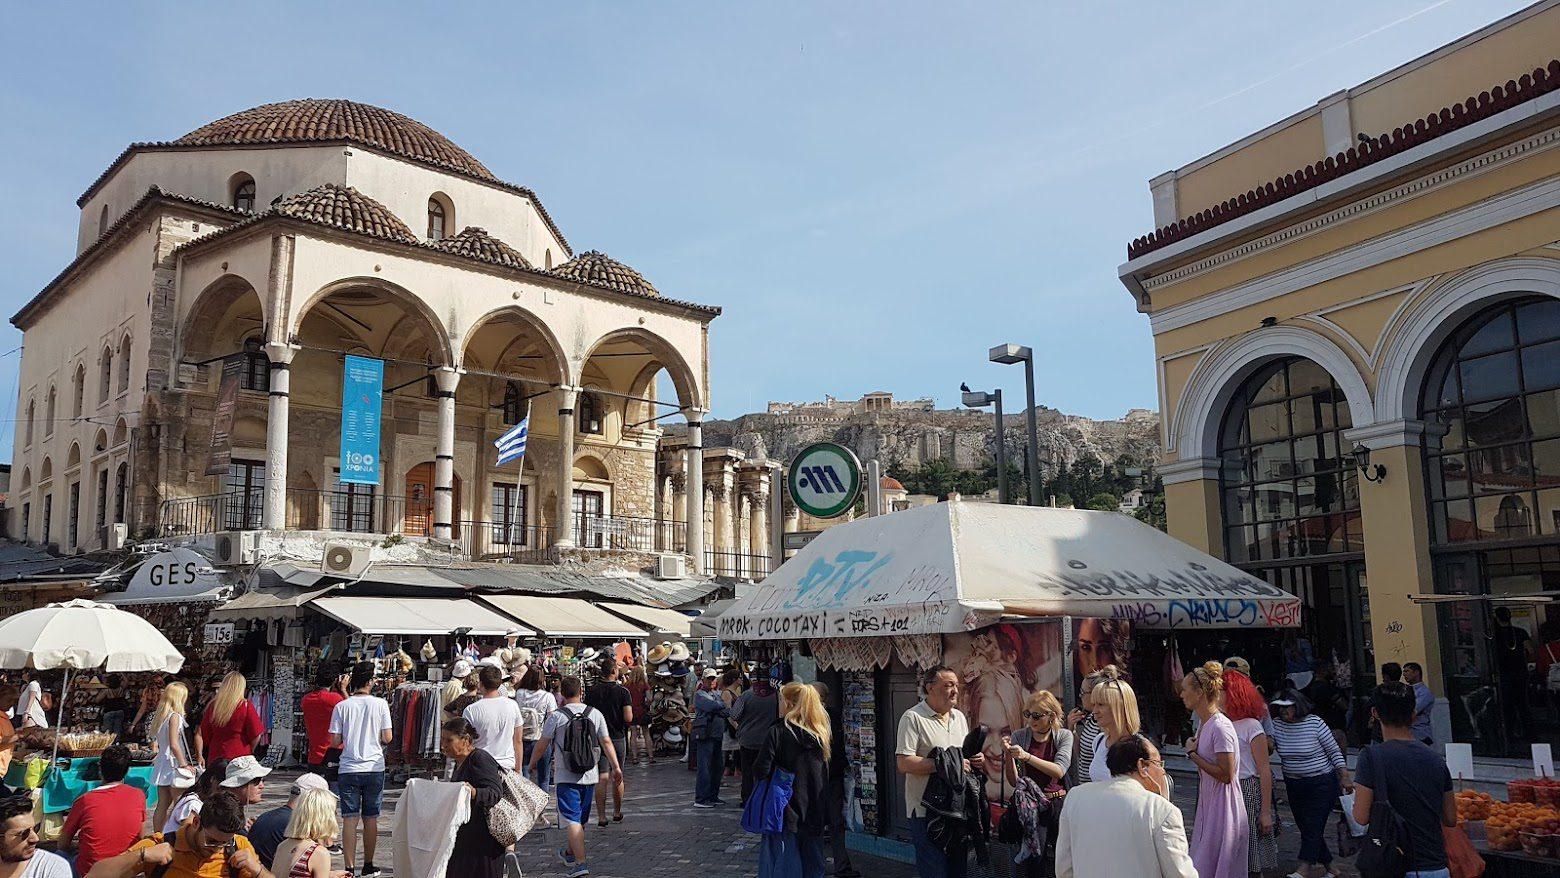 Crowds on Monastiraki Square in Athens